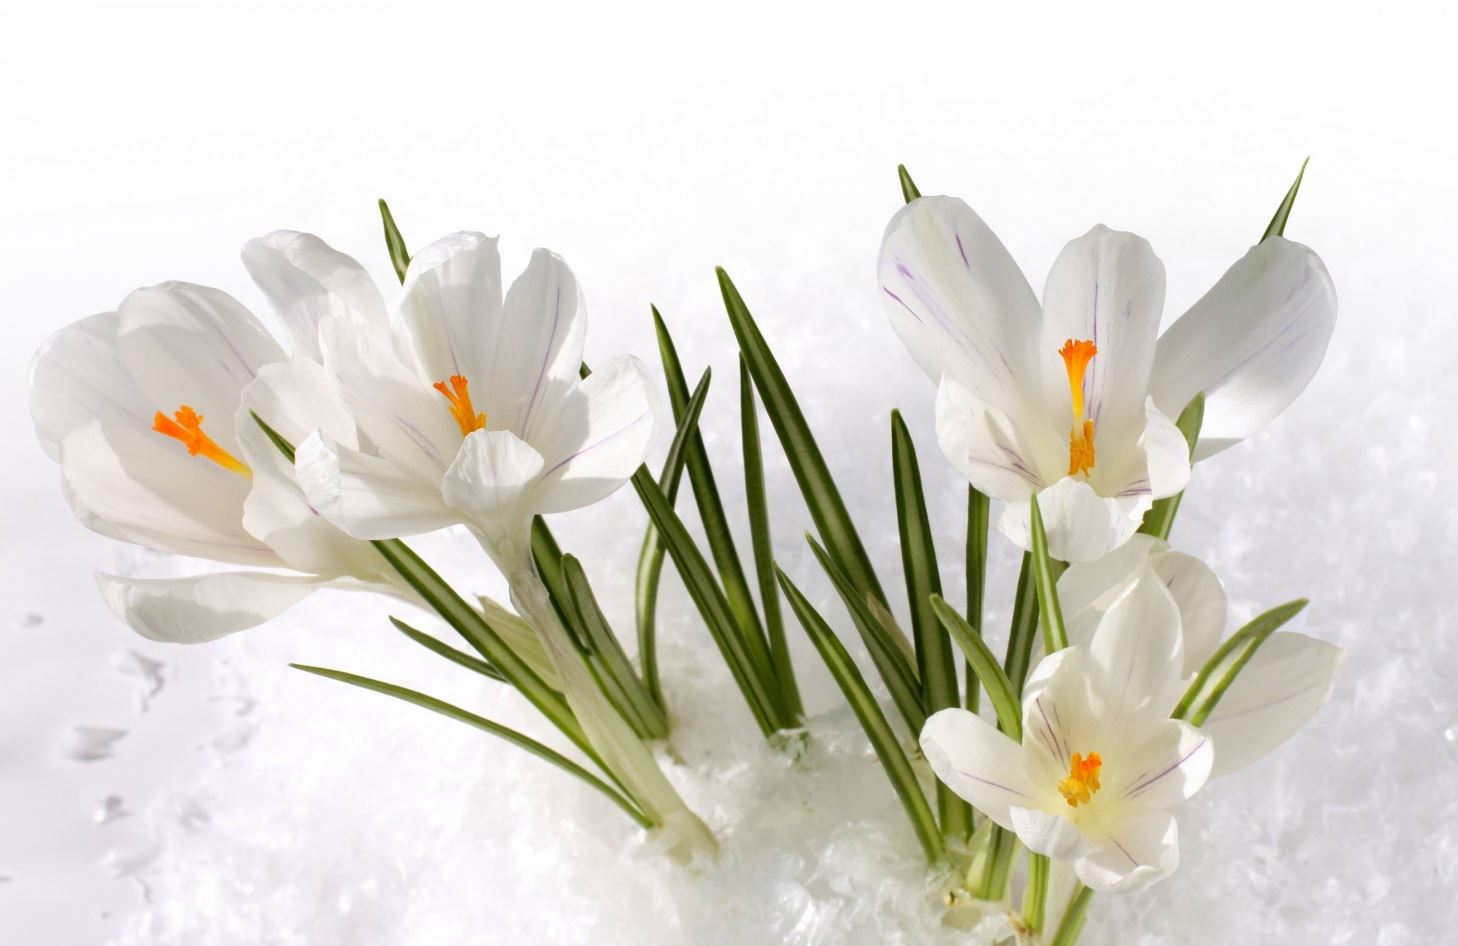 картинки весна природа (10)